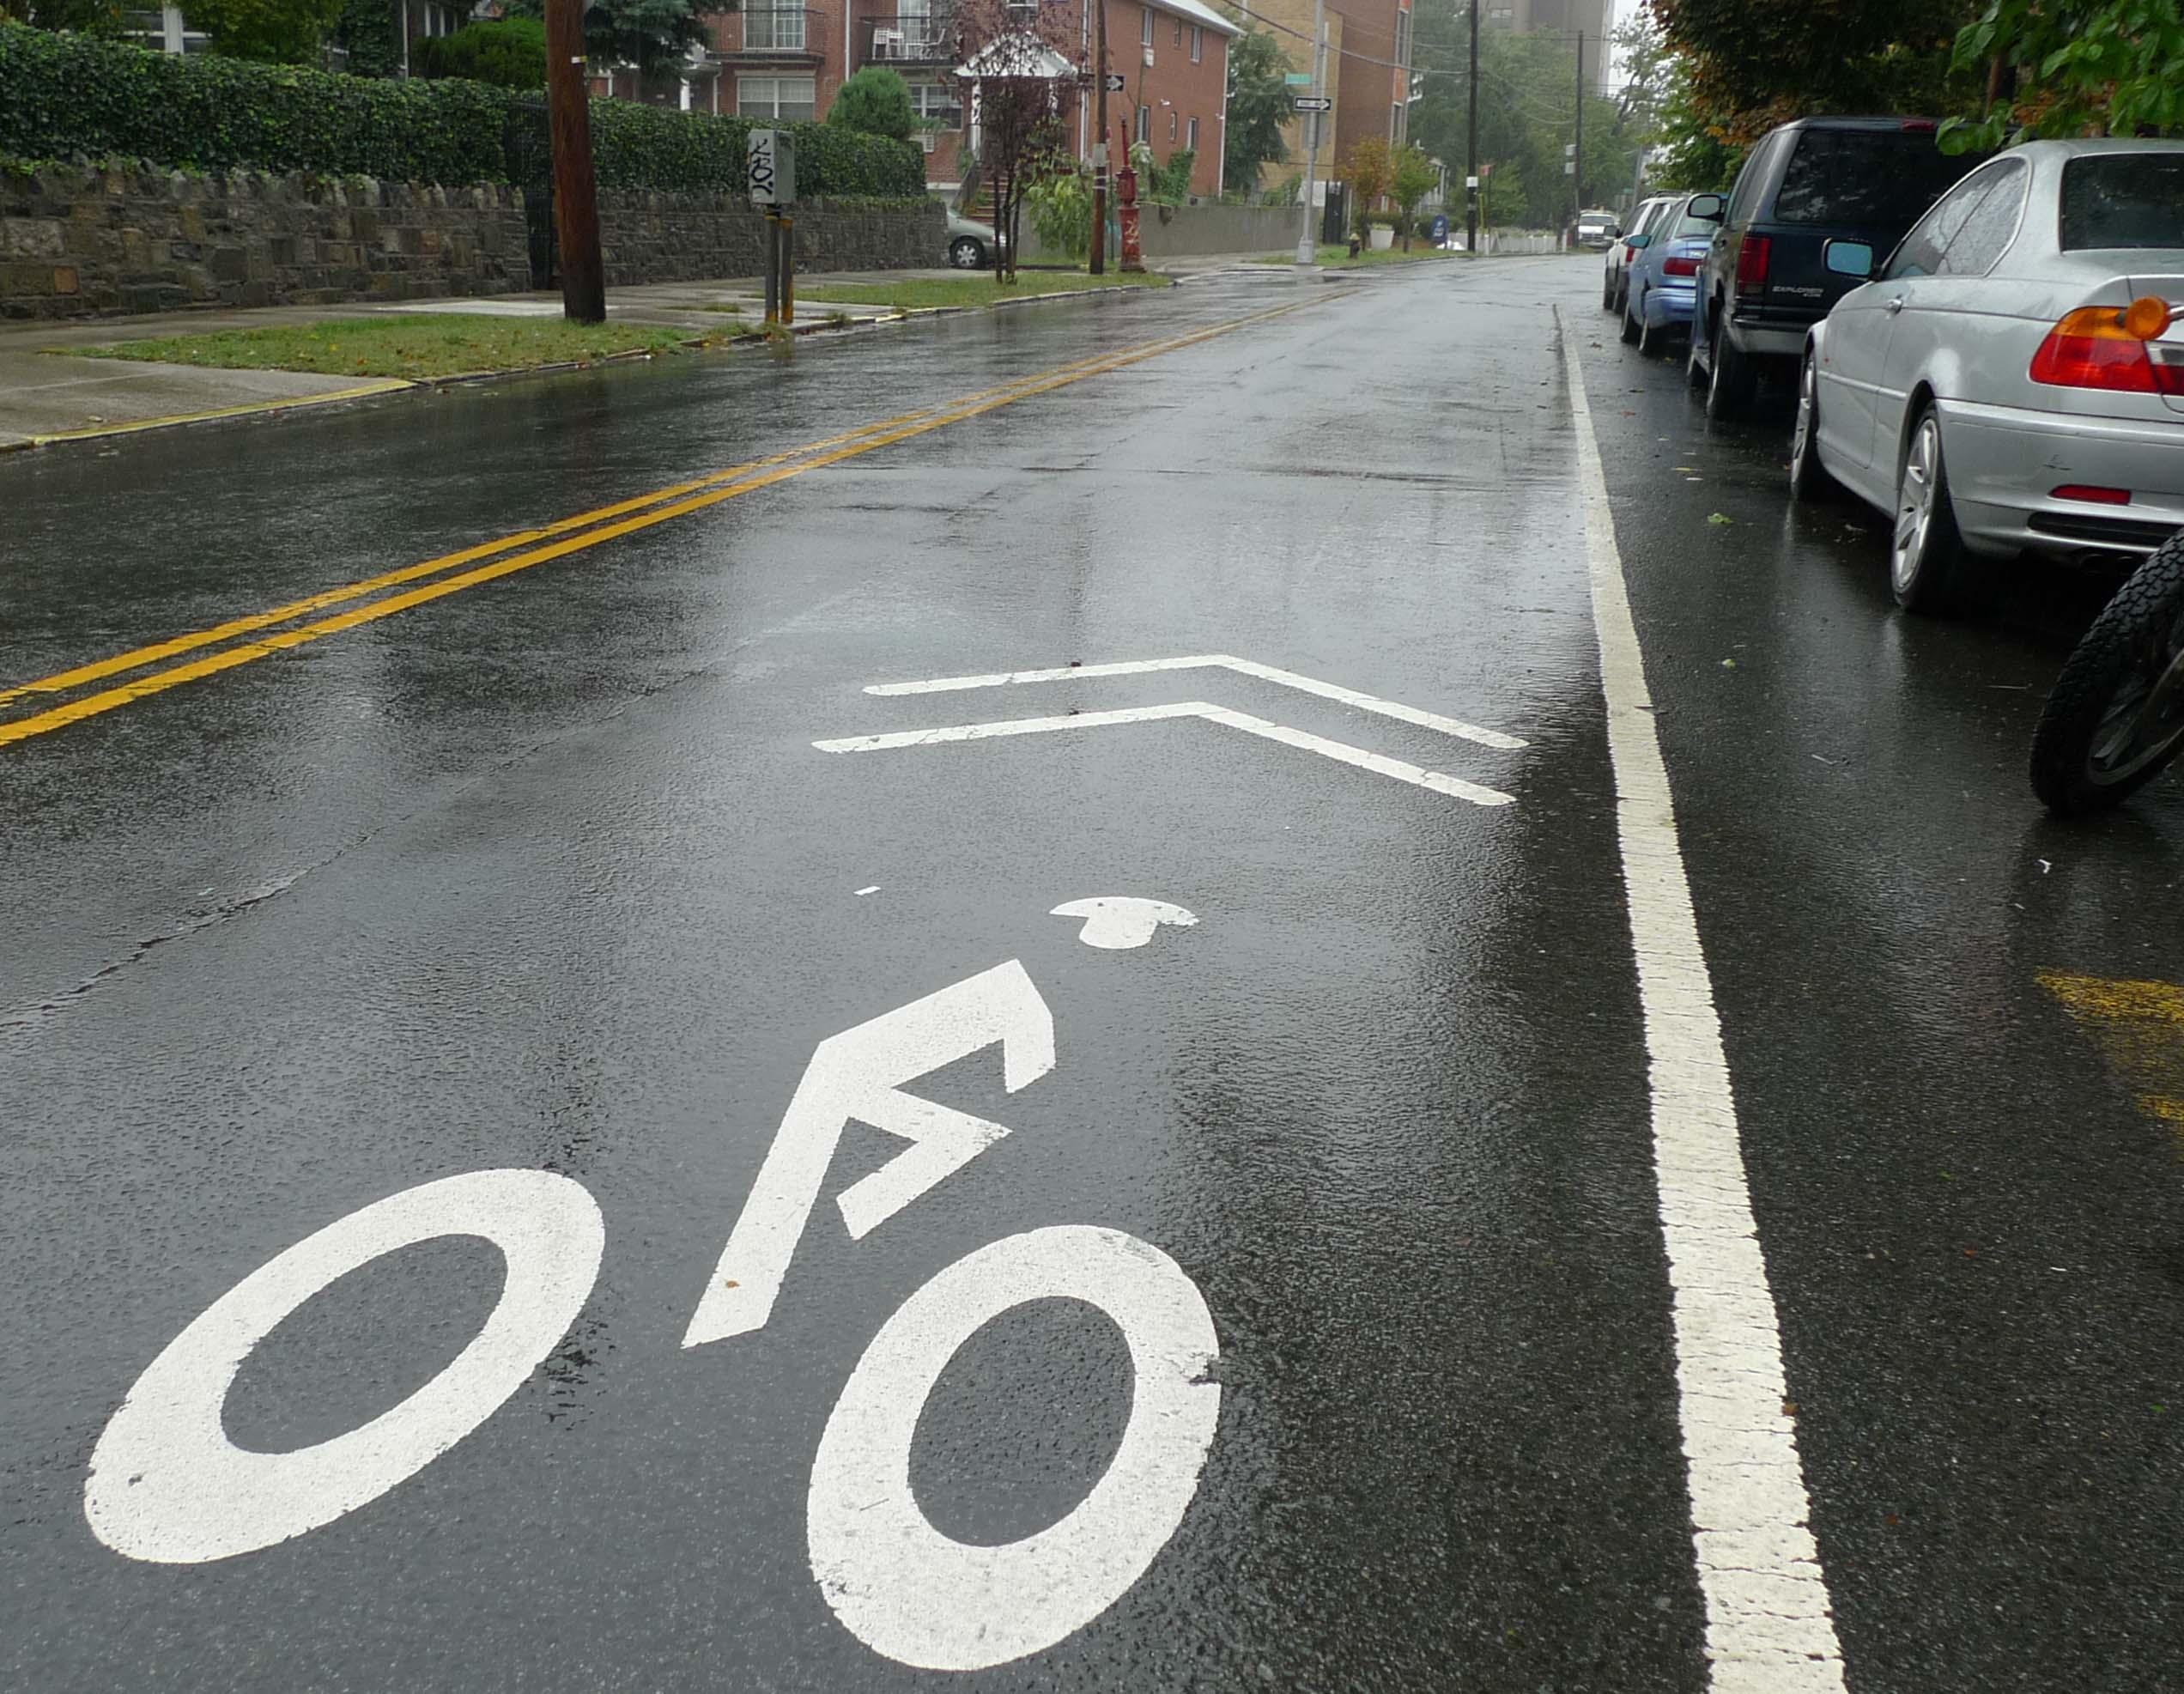 Bike Lane Map Nyc The Best Bikes - Nyc map bike lanes